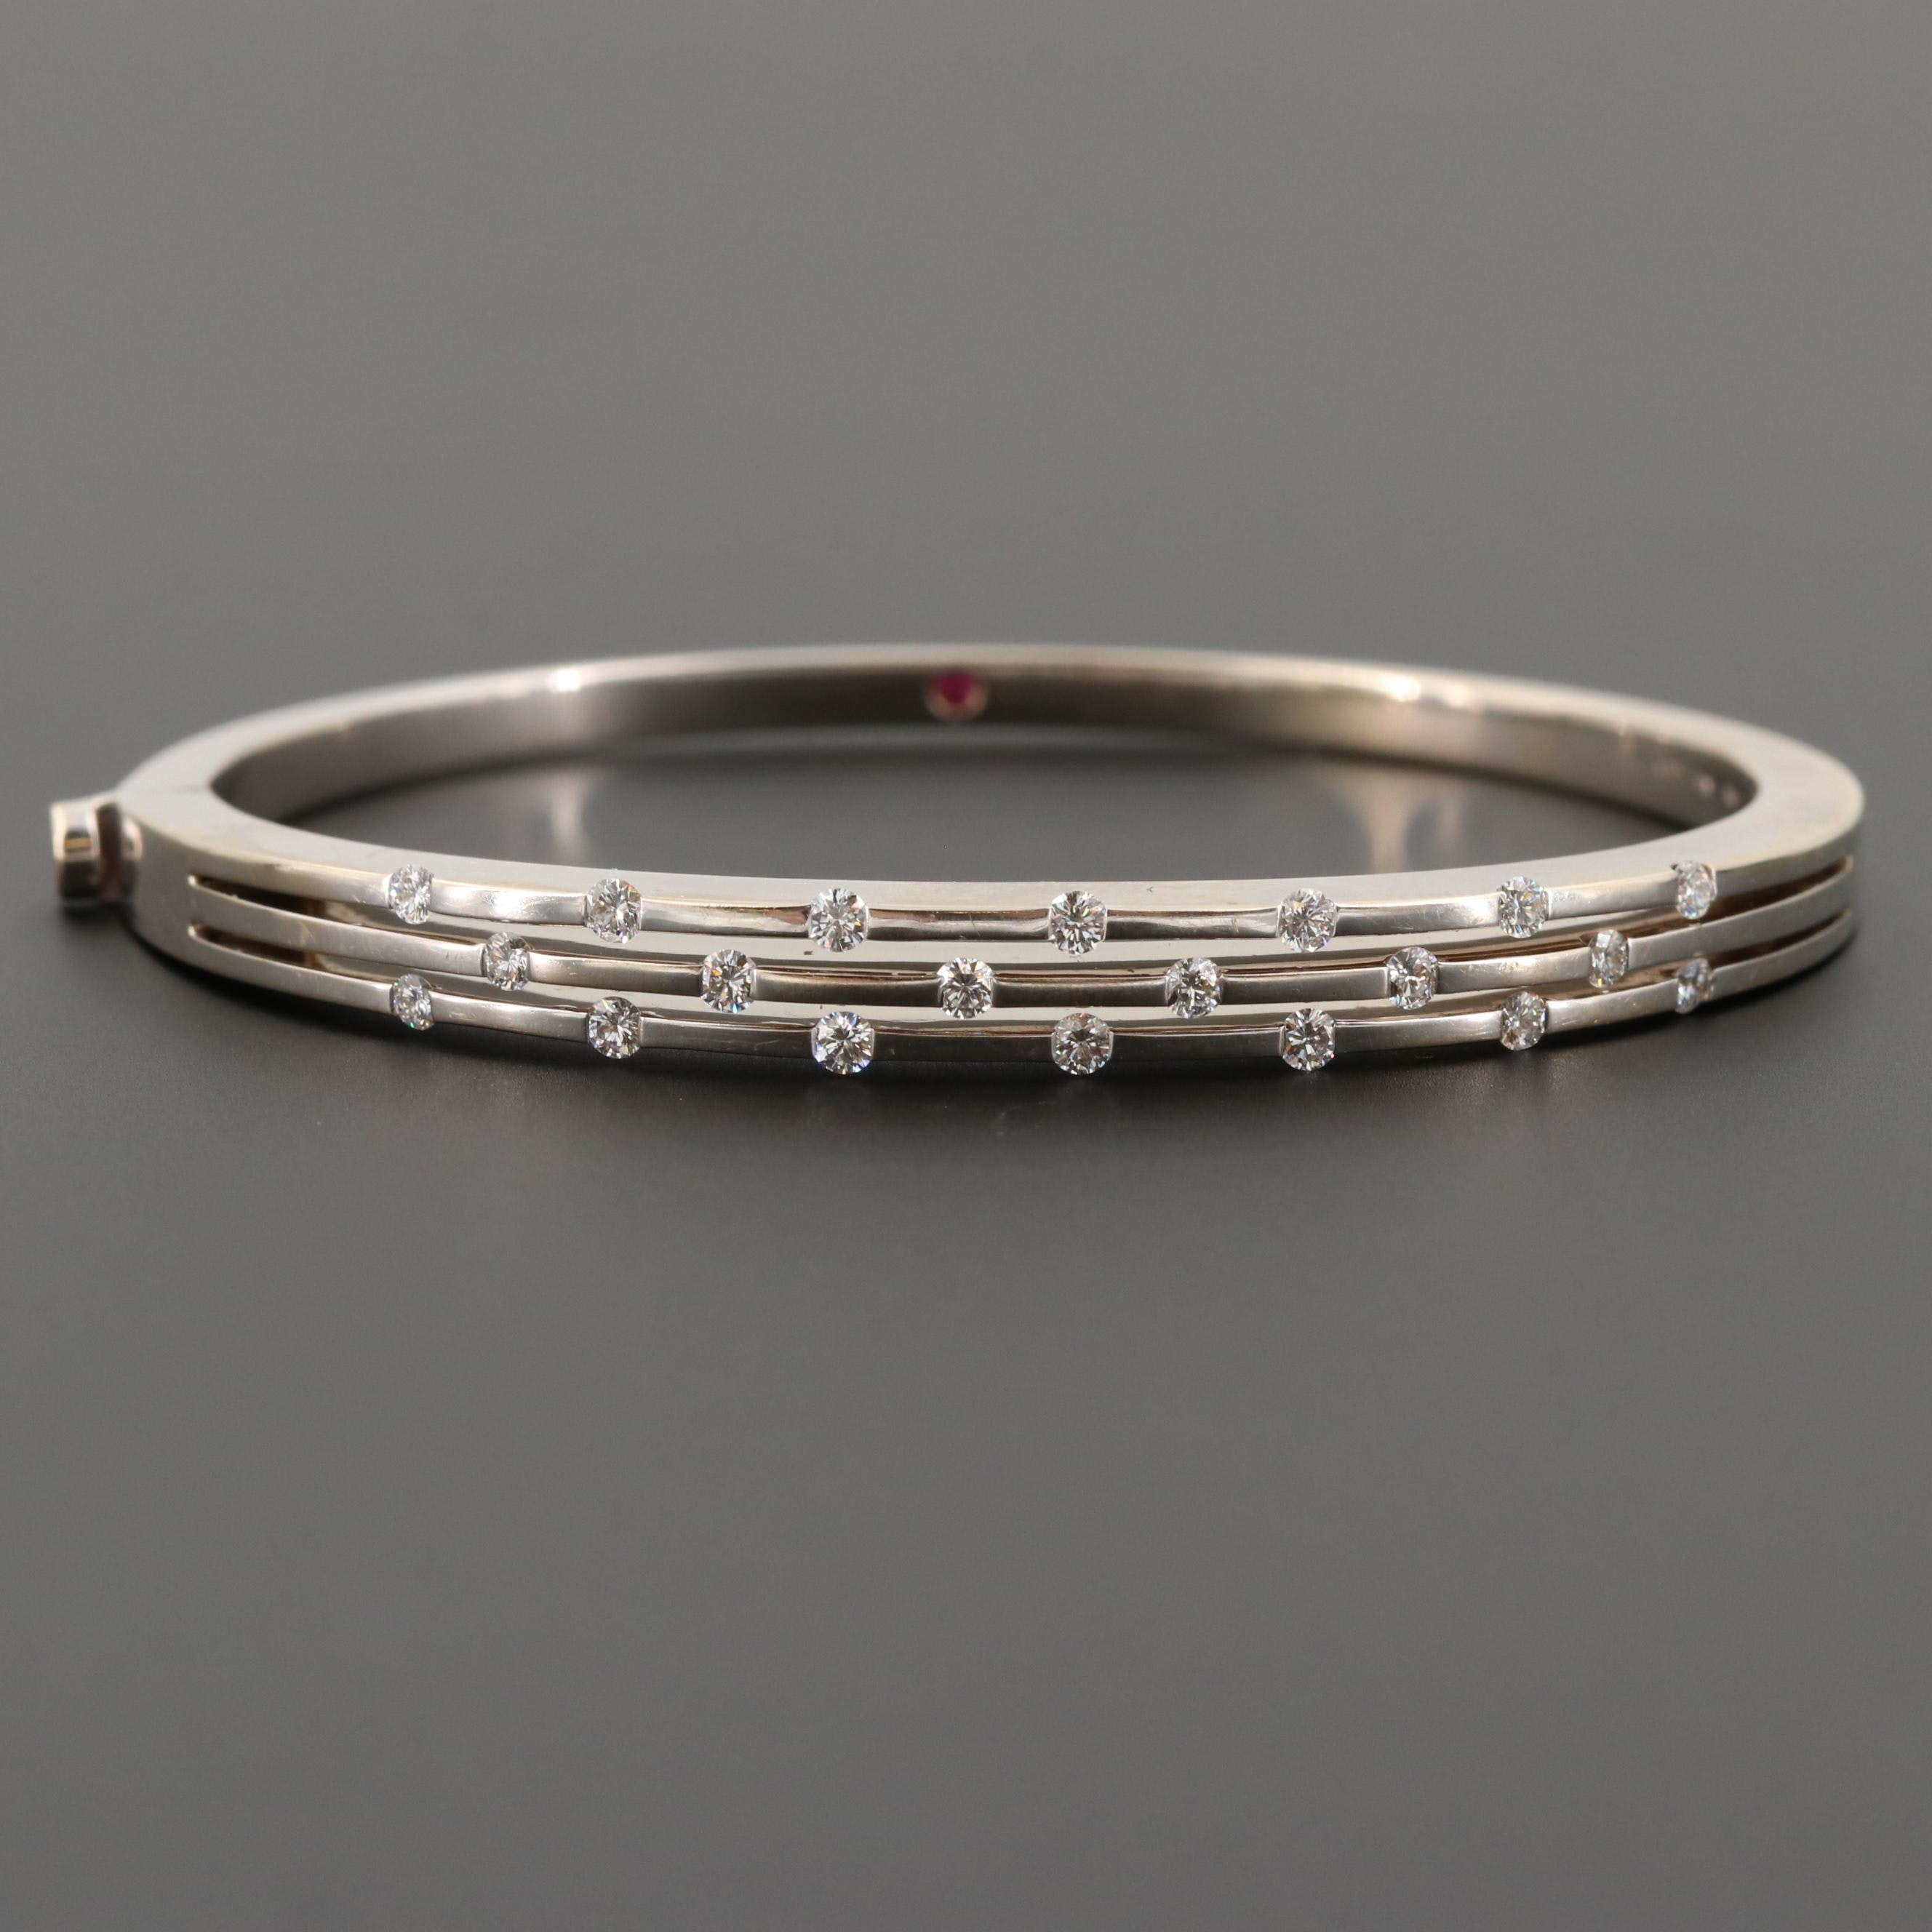 "Roberto Coin ""Classica Parisienne"" 18K White Gold 1.00 CTW Diamond Bracelet"